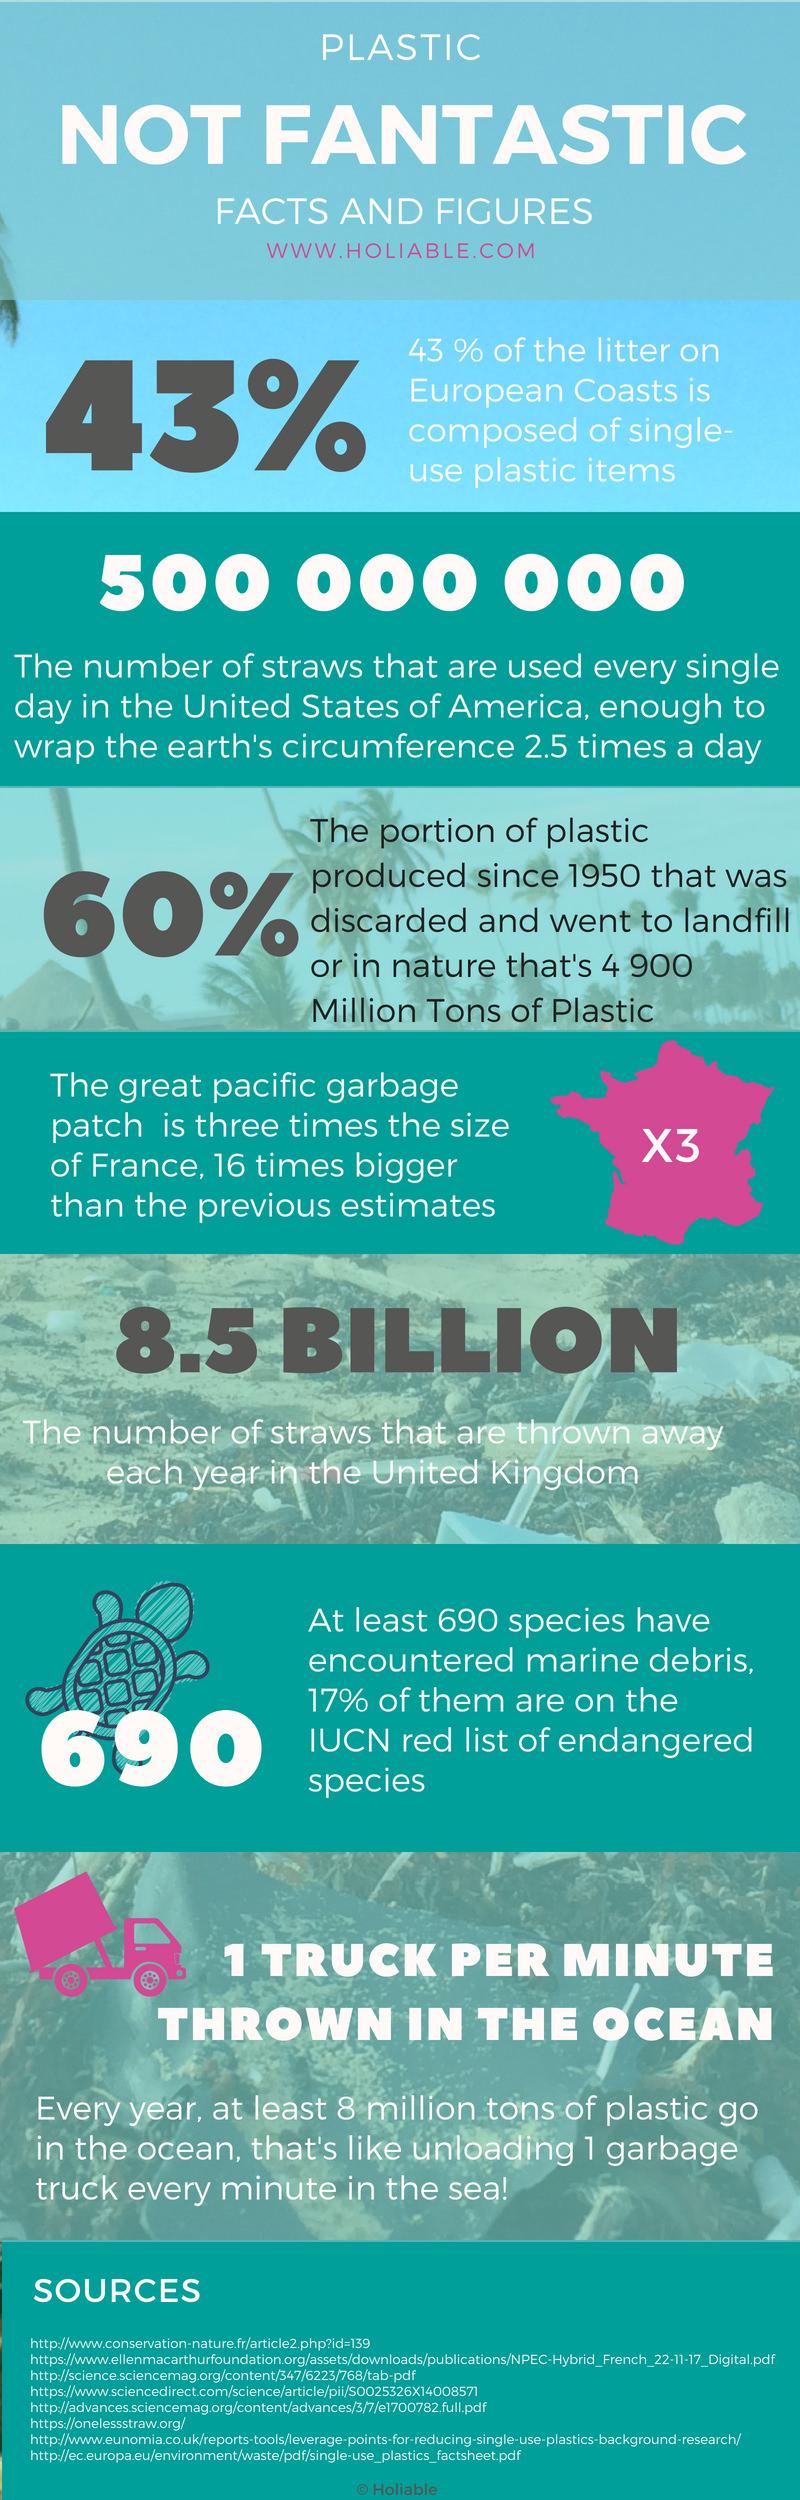 infographic_plasticfactsandfigures